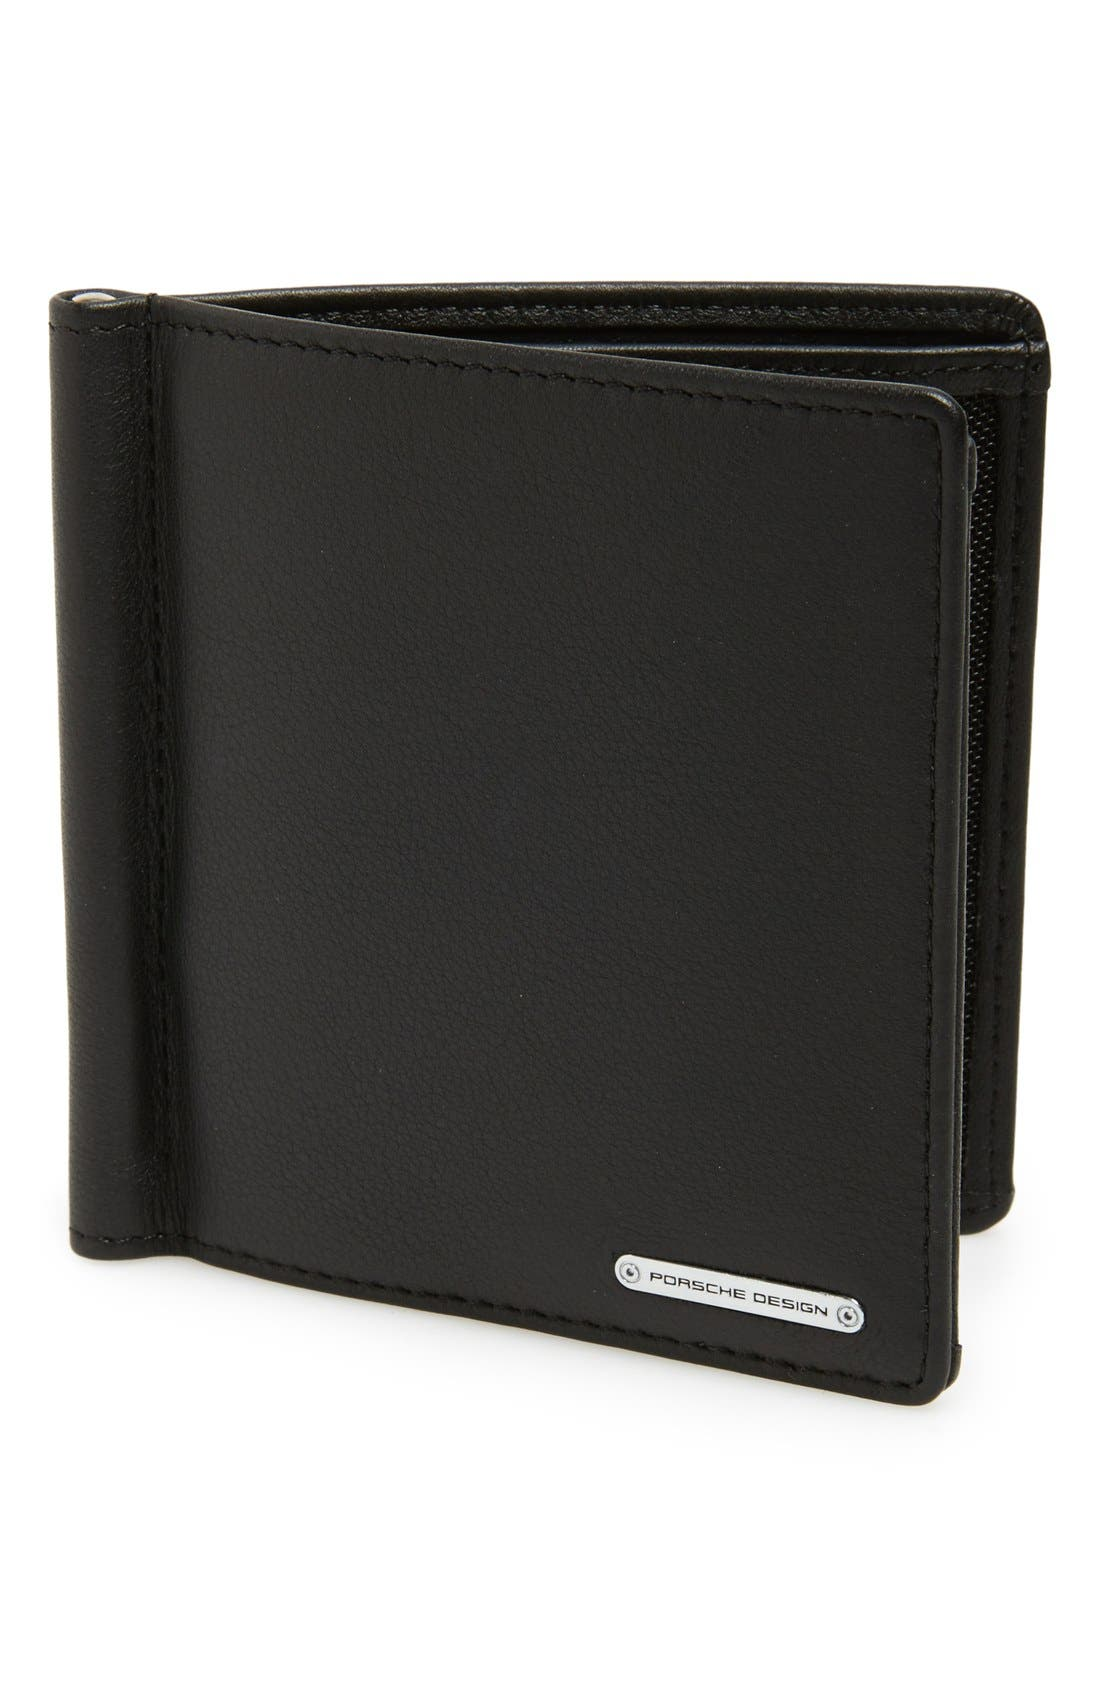 'CL2 2.0' Money Clip Card Holder,                         Main,                         color, Black